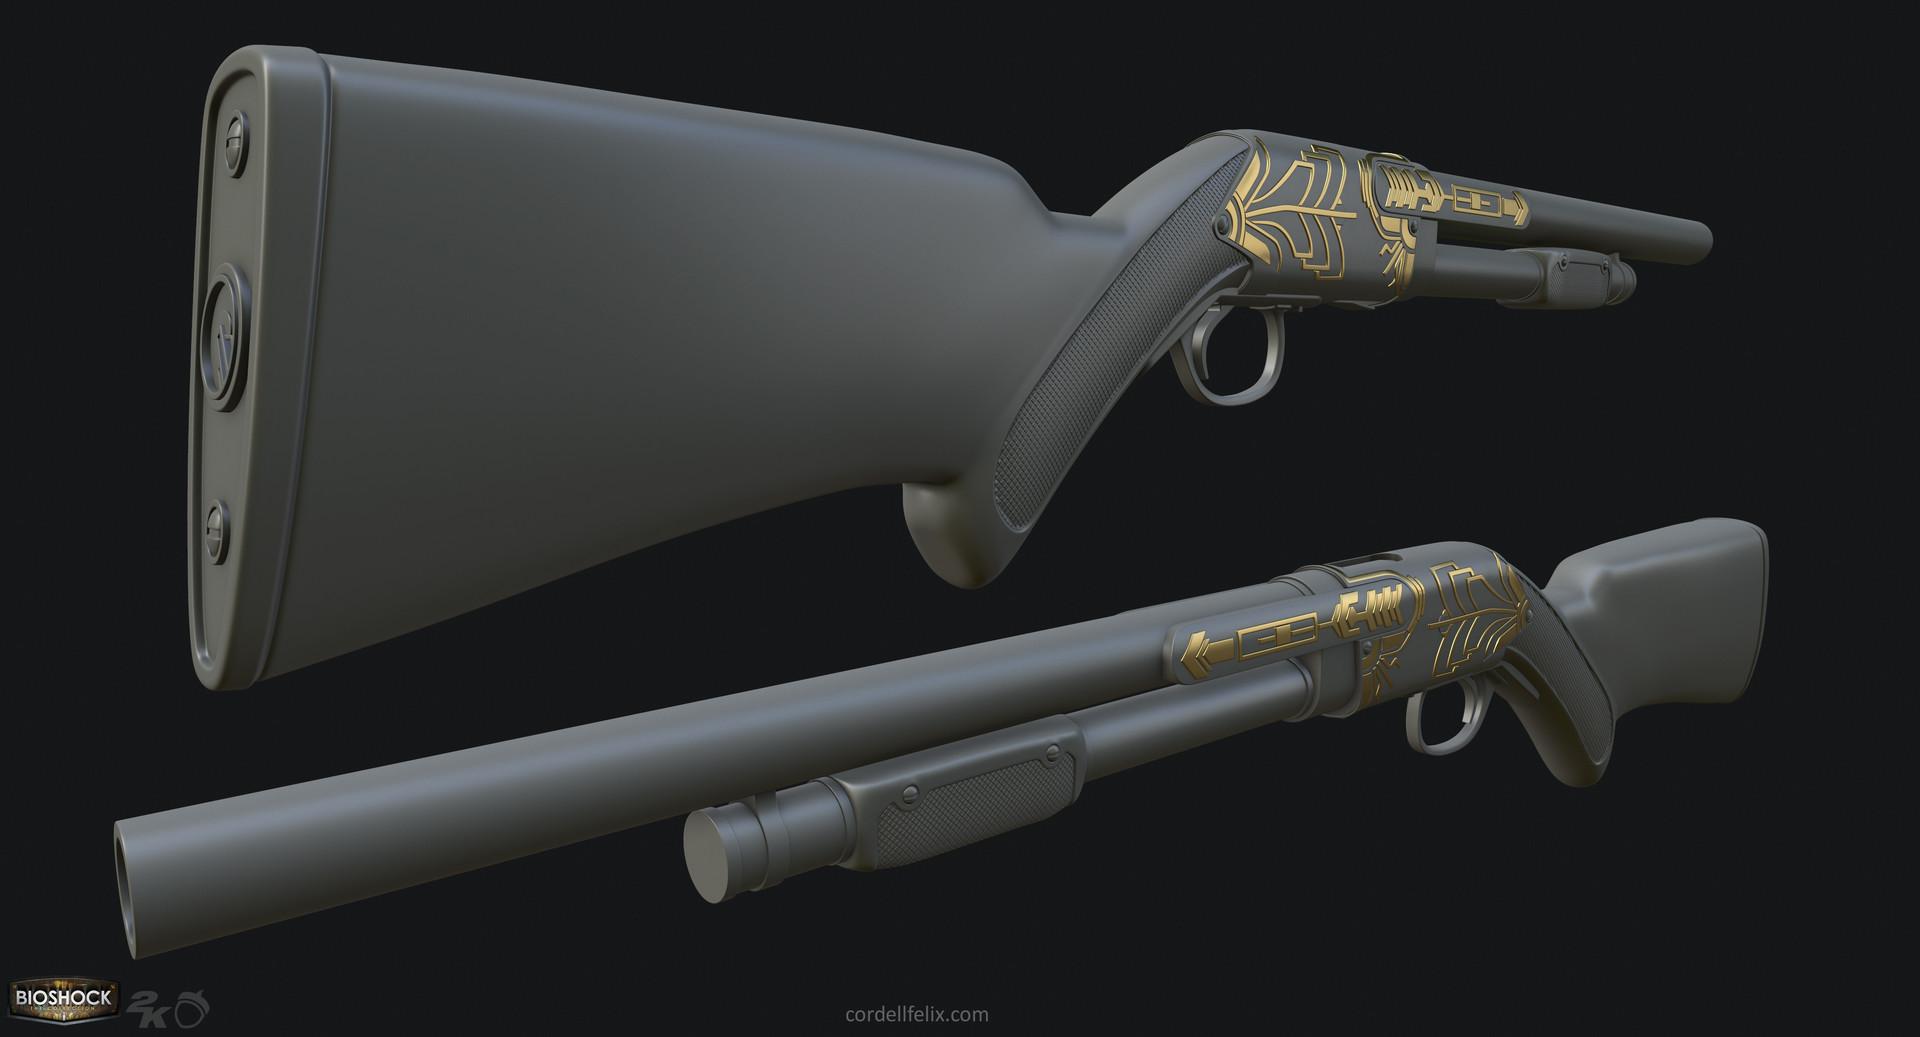 Cordell felix cordellfelix bioshock shotgun hp 05